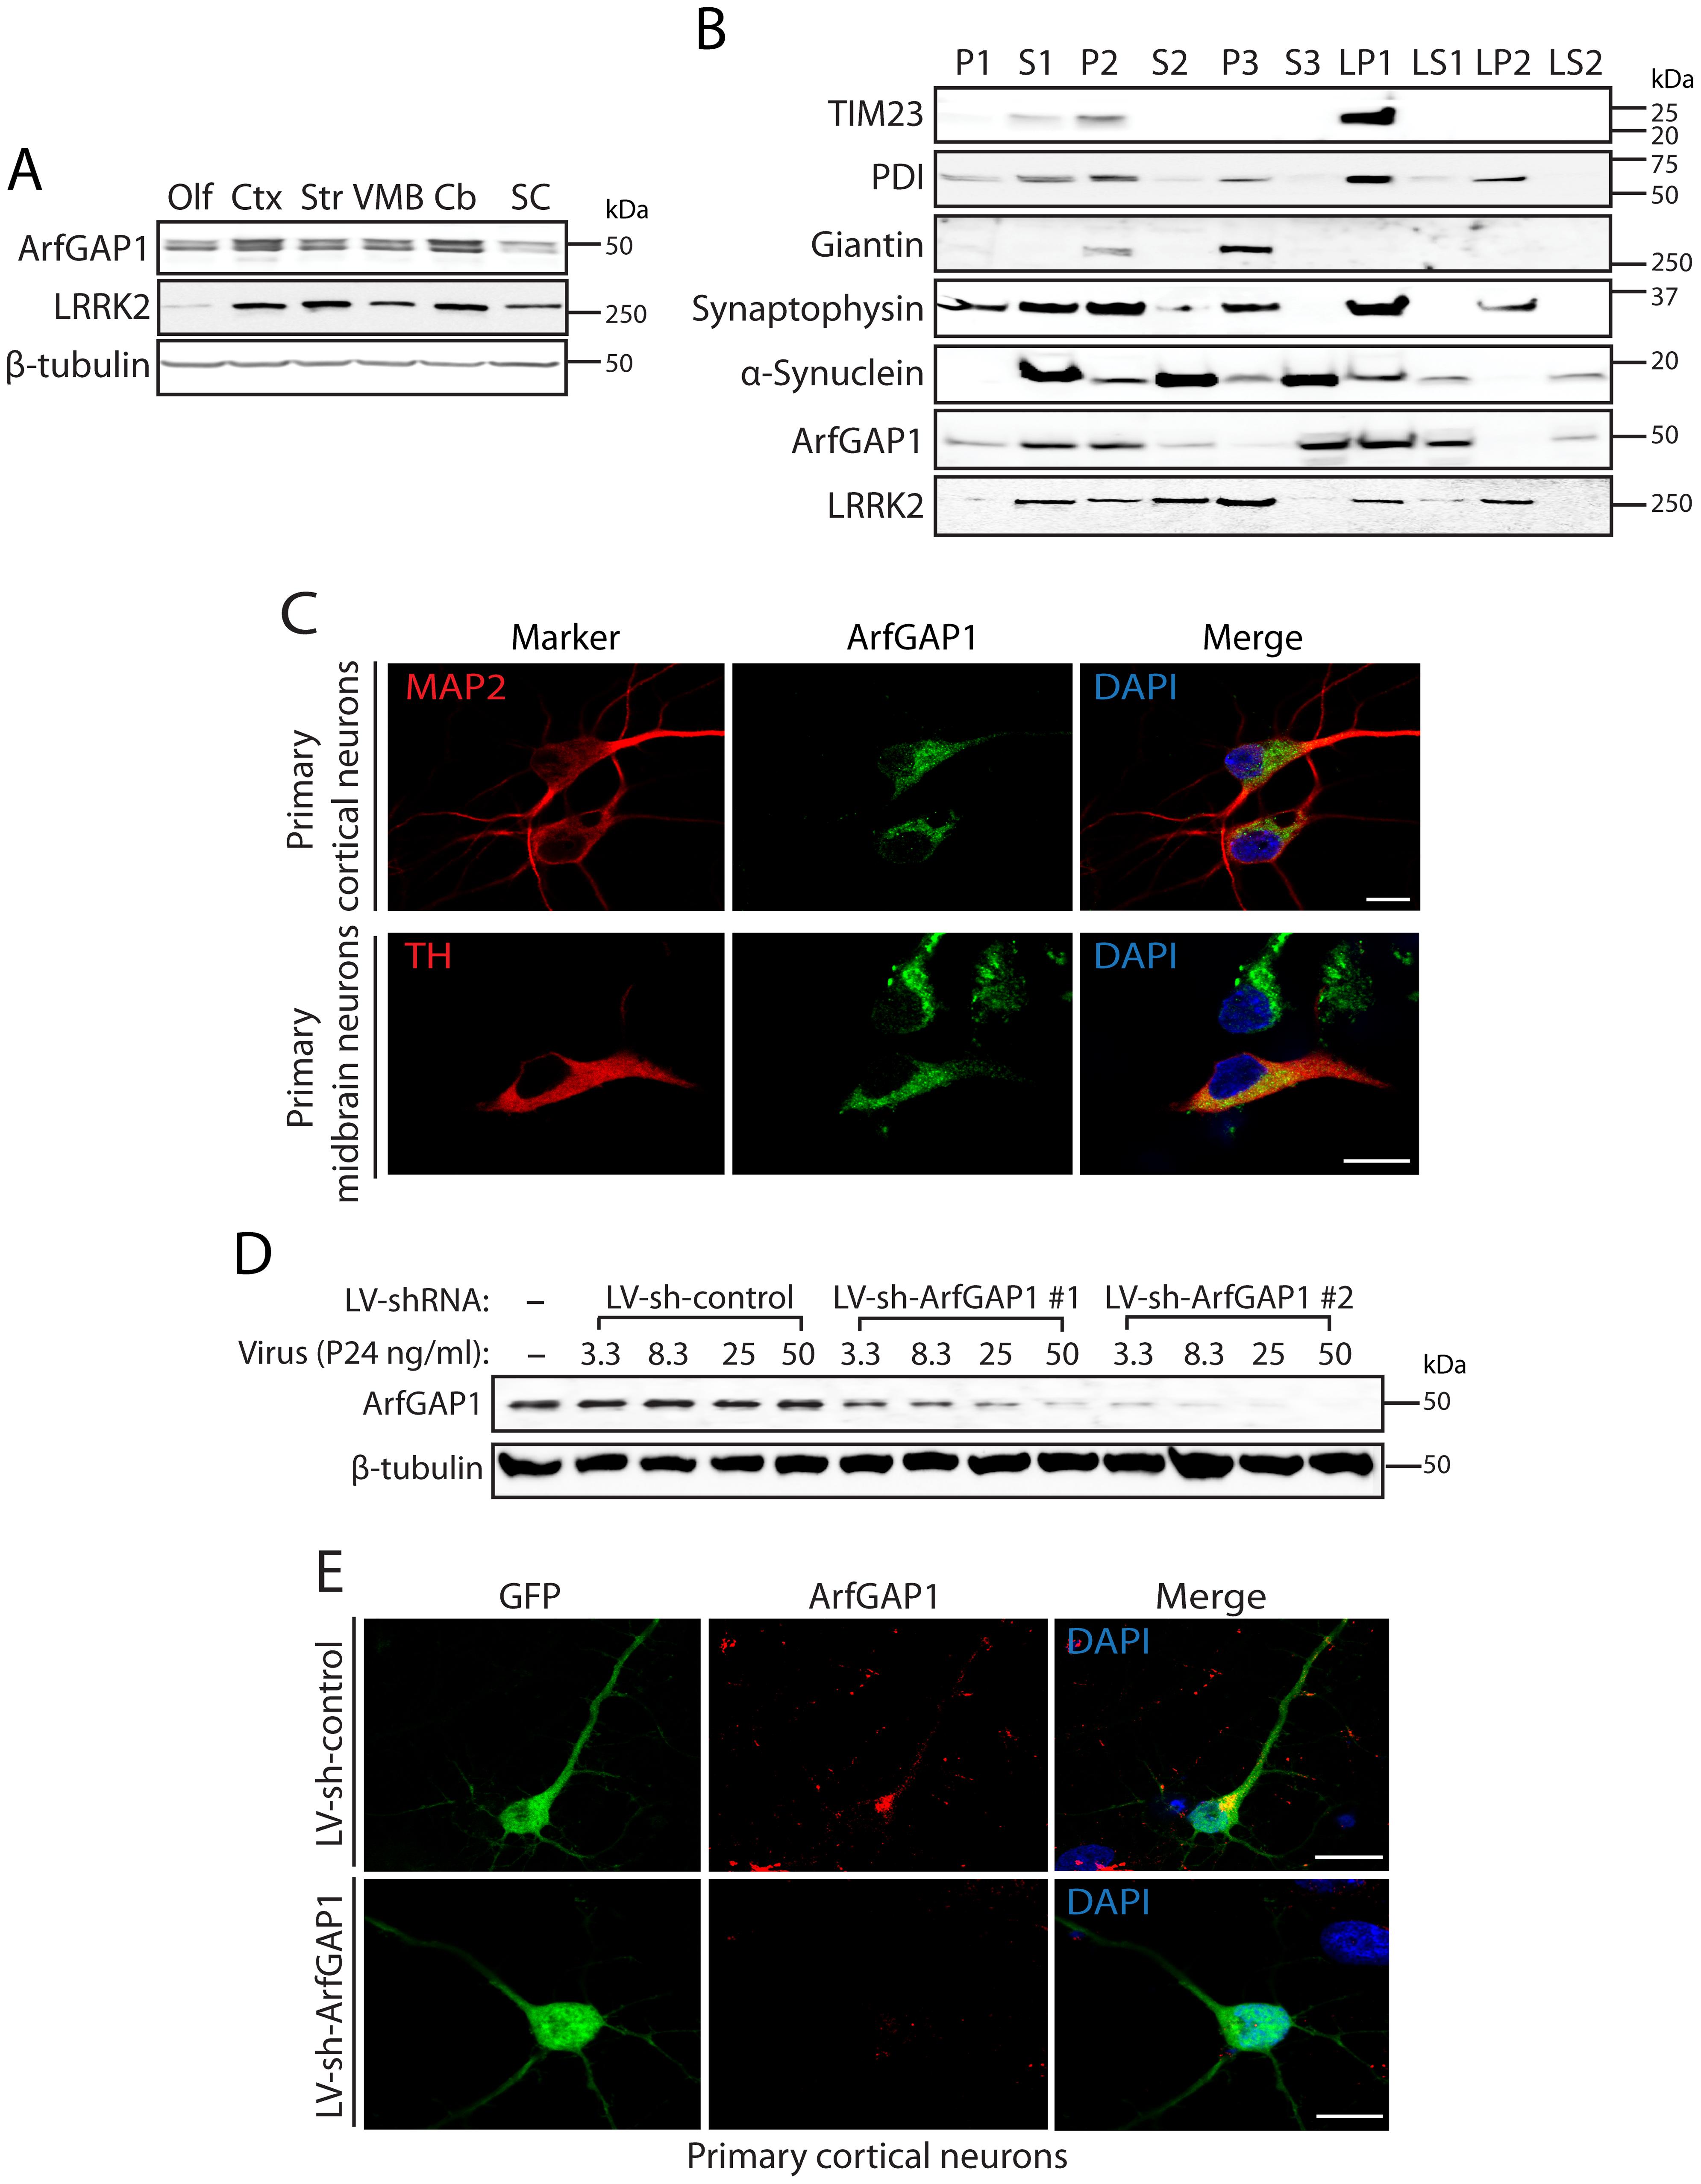 ArfGAP1 is expressed in the mammalian brain.